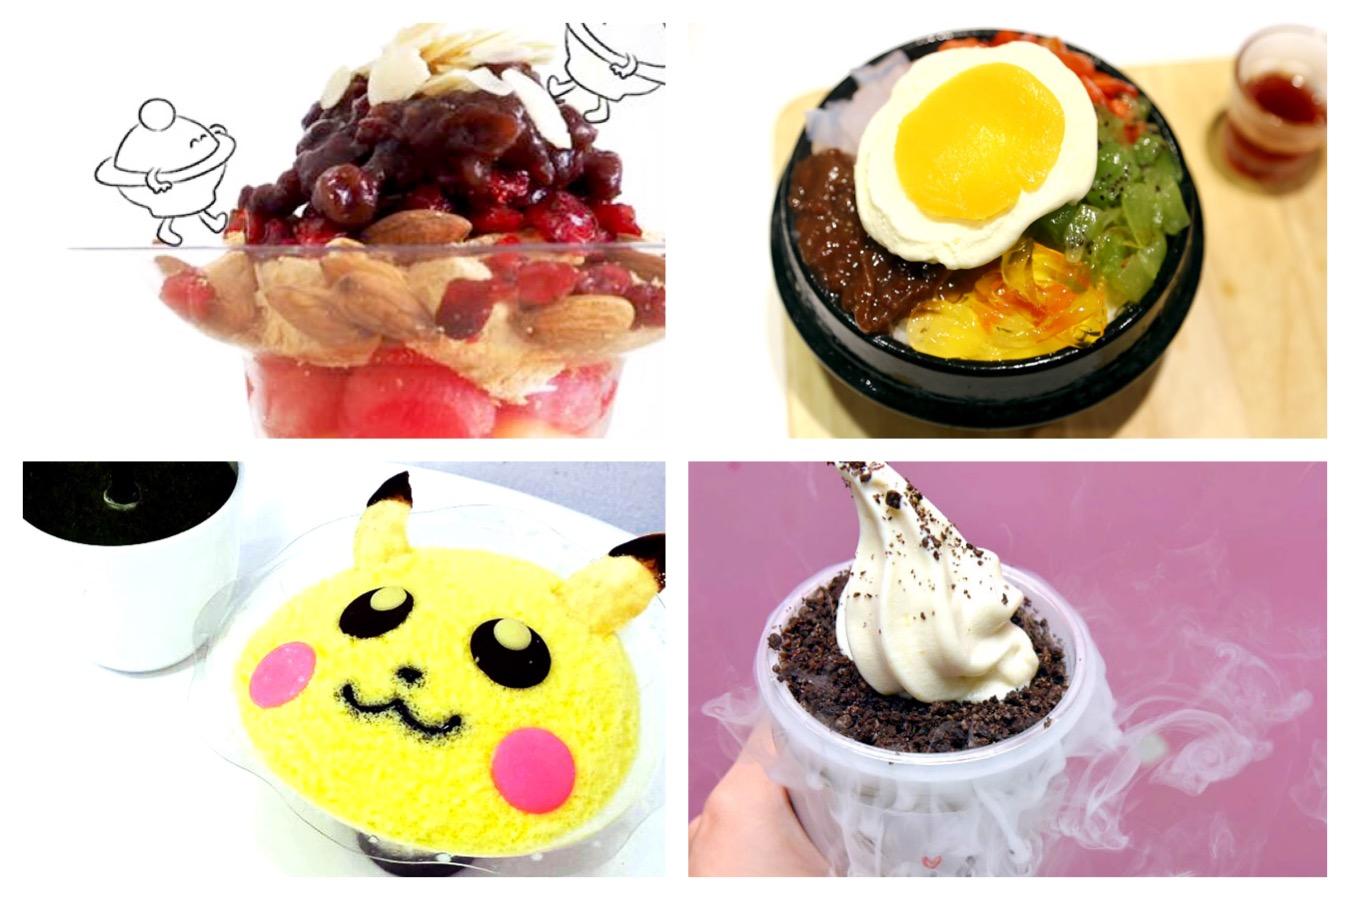 10 NEW Korean Bingsu Shops In Singapore - Sweet Dessert Shavings To Cool You Down